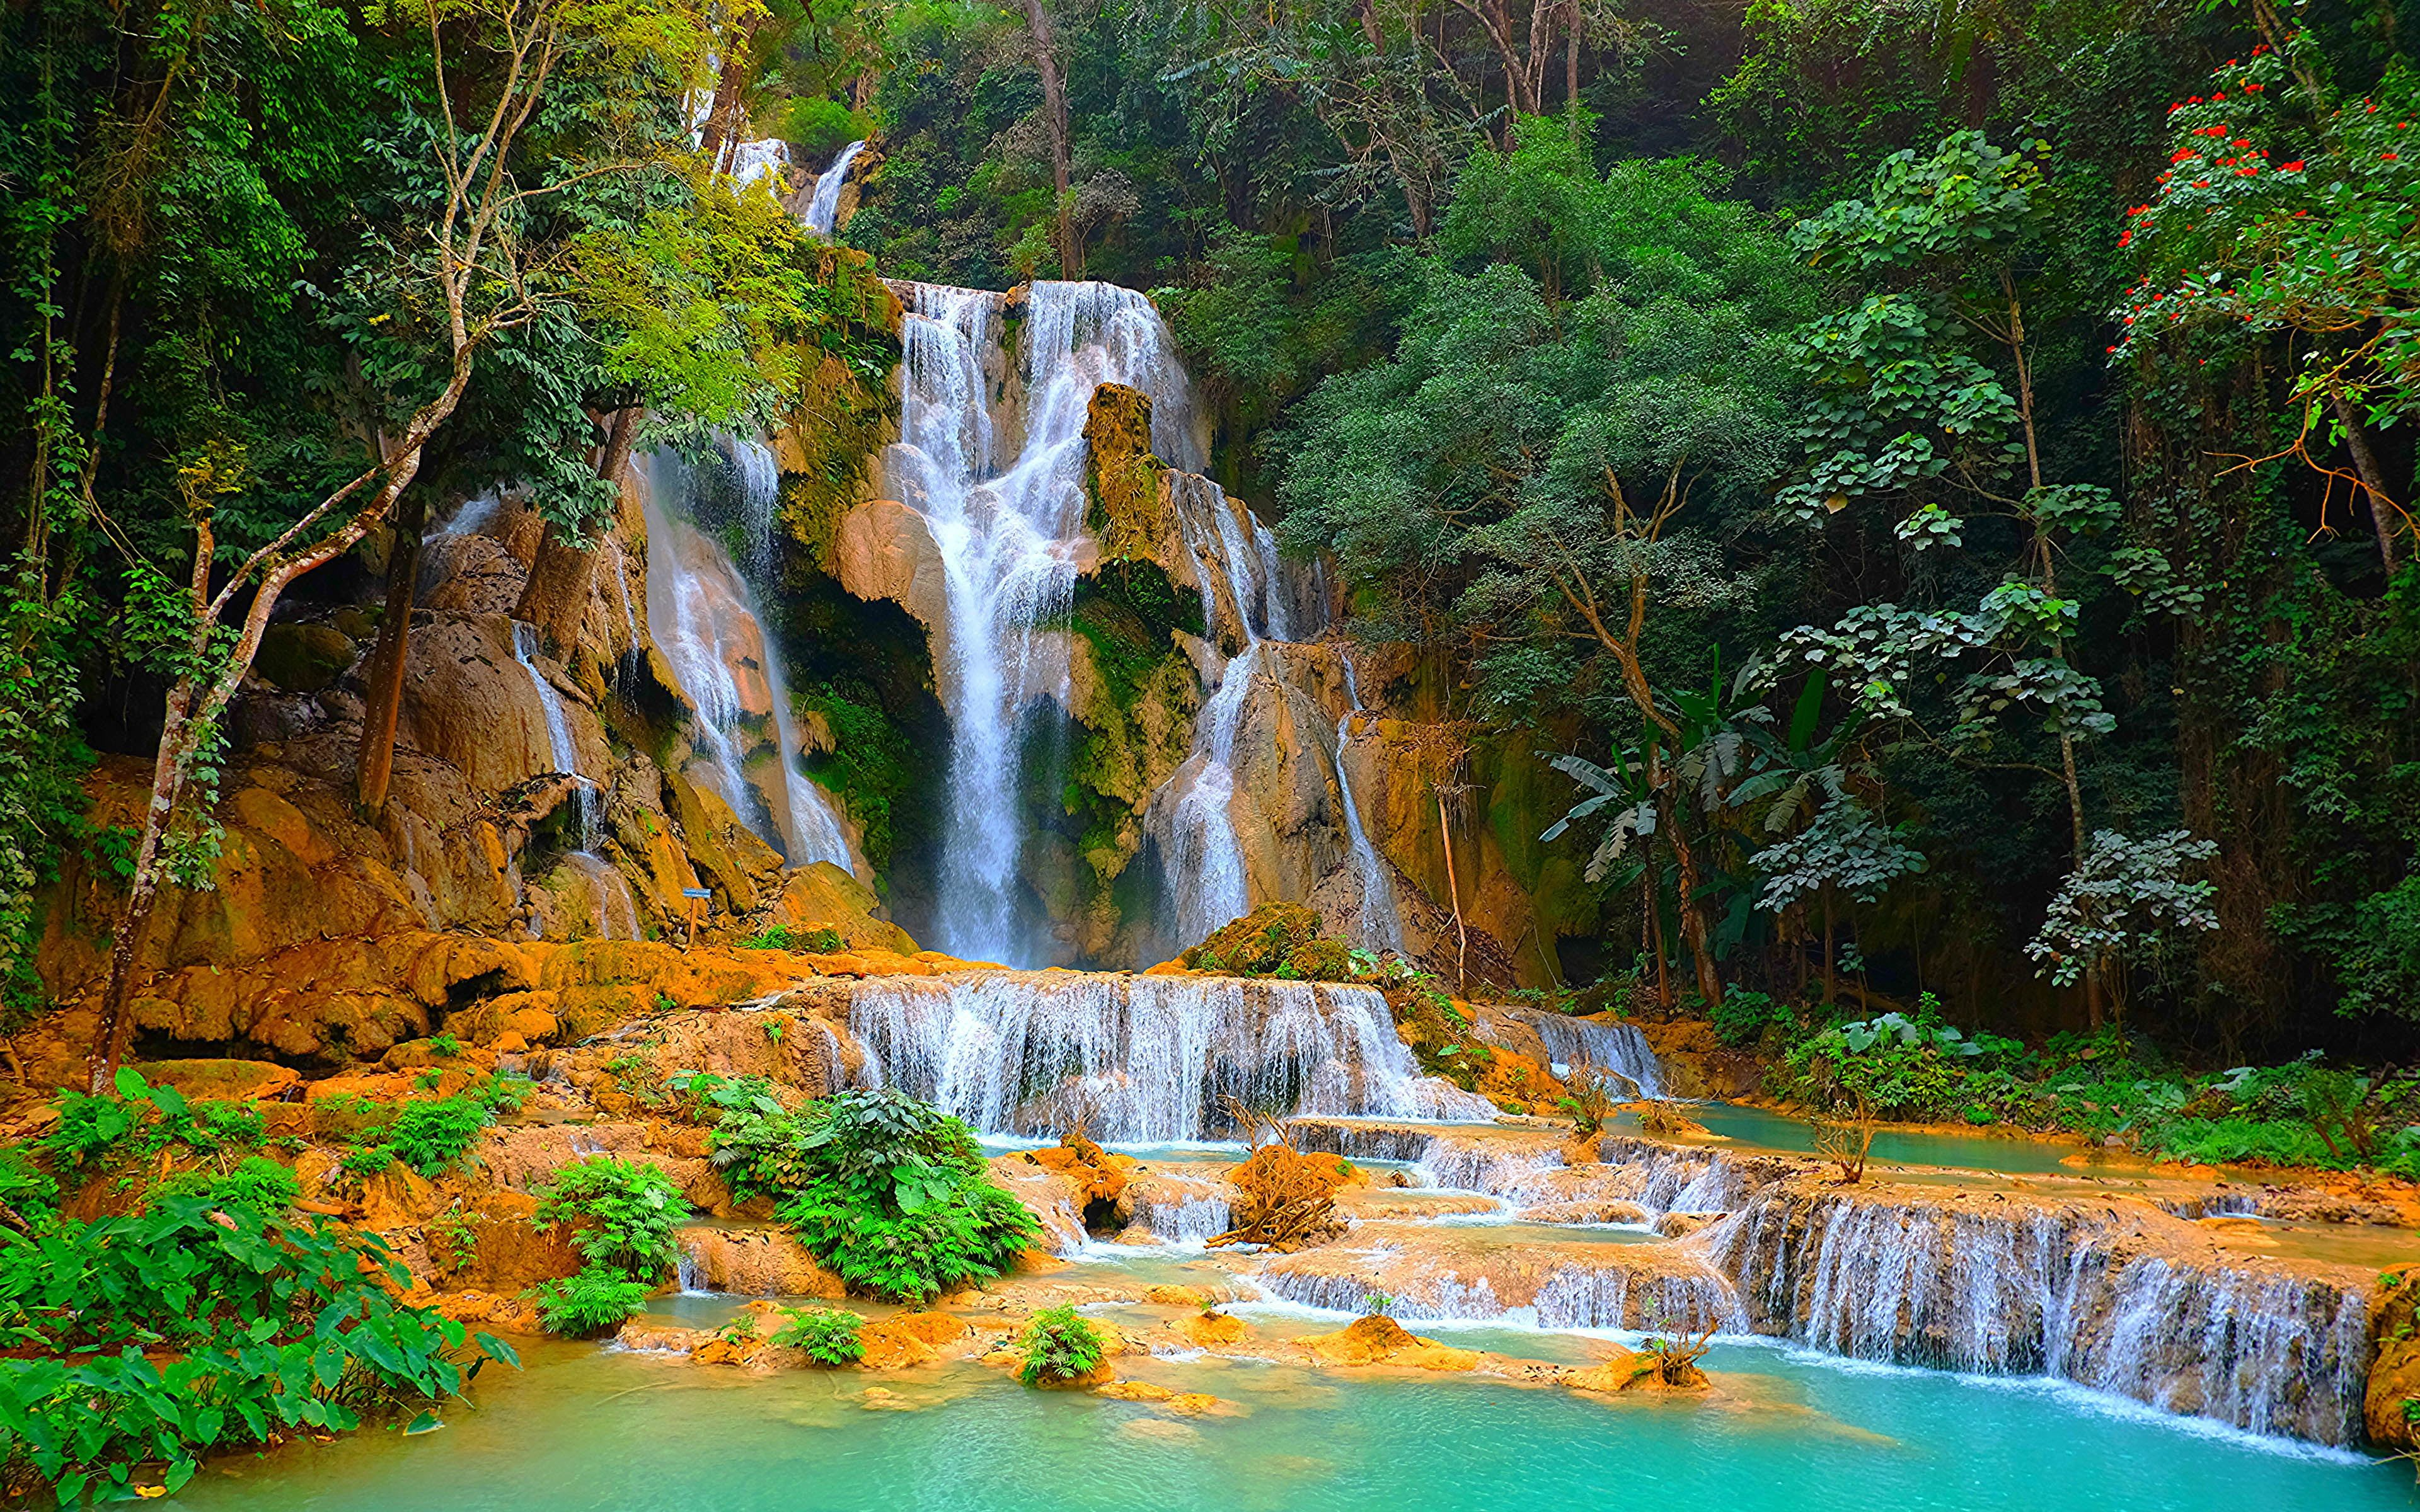 Kuang Si Falls Or Tat Kuang Si Waterfalls In Laos Crag Ultra Hd Wallpapers For Mobile Laptop And Tablet 384 In 2020 Beautiful Landscape Wallpaper Laos Travel Waterfall